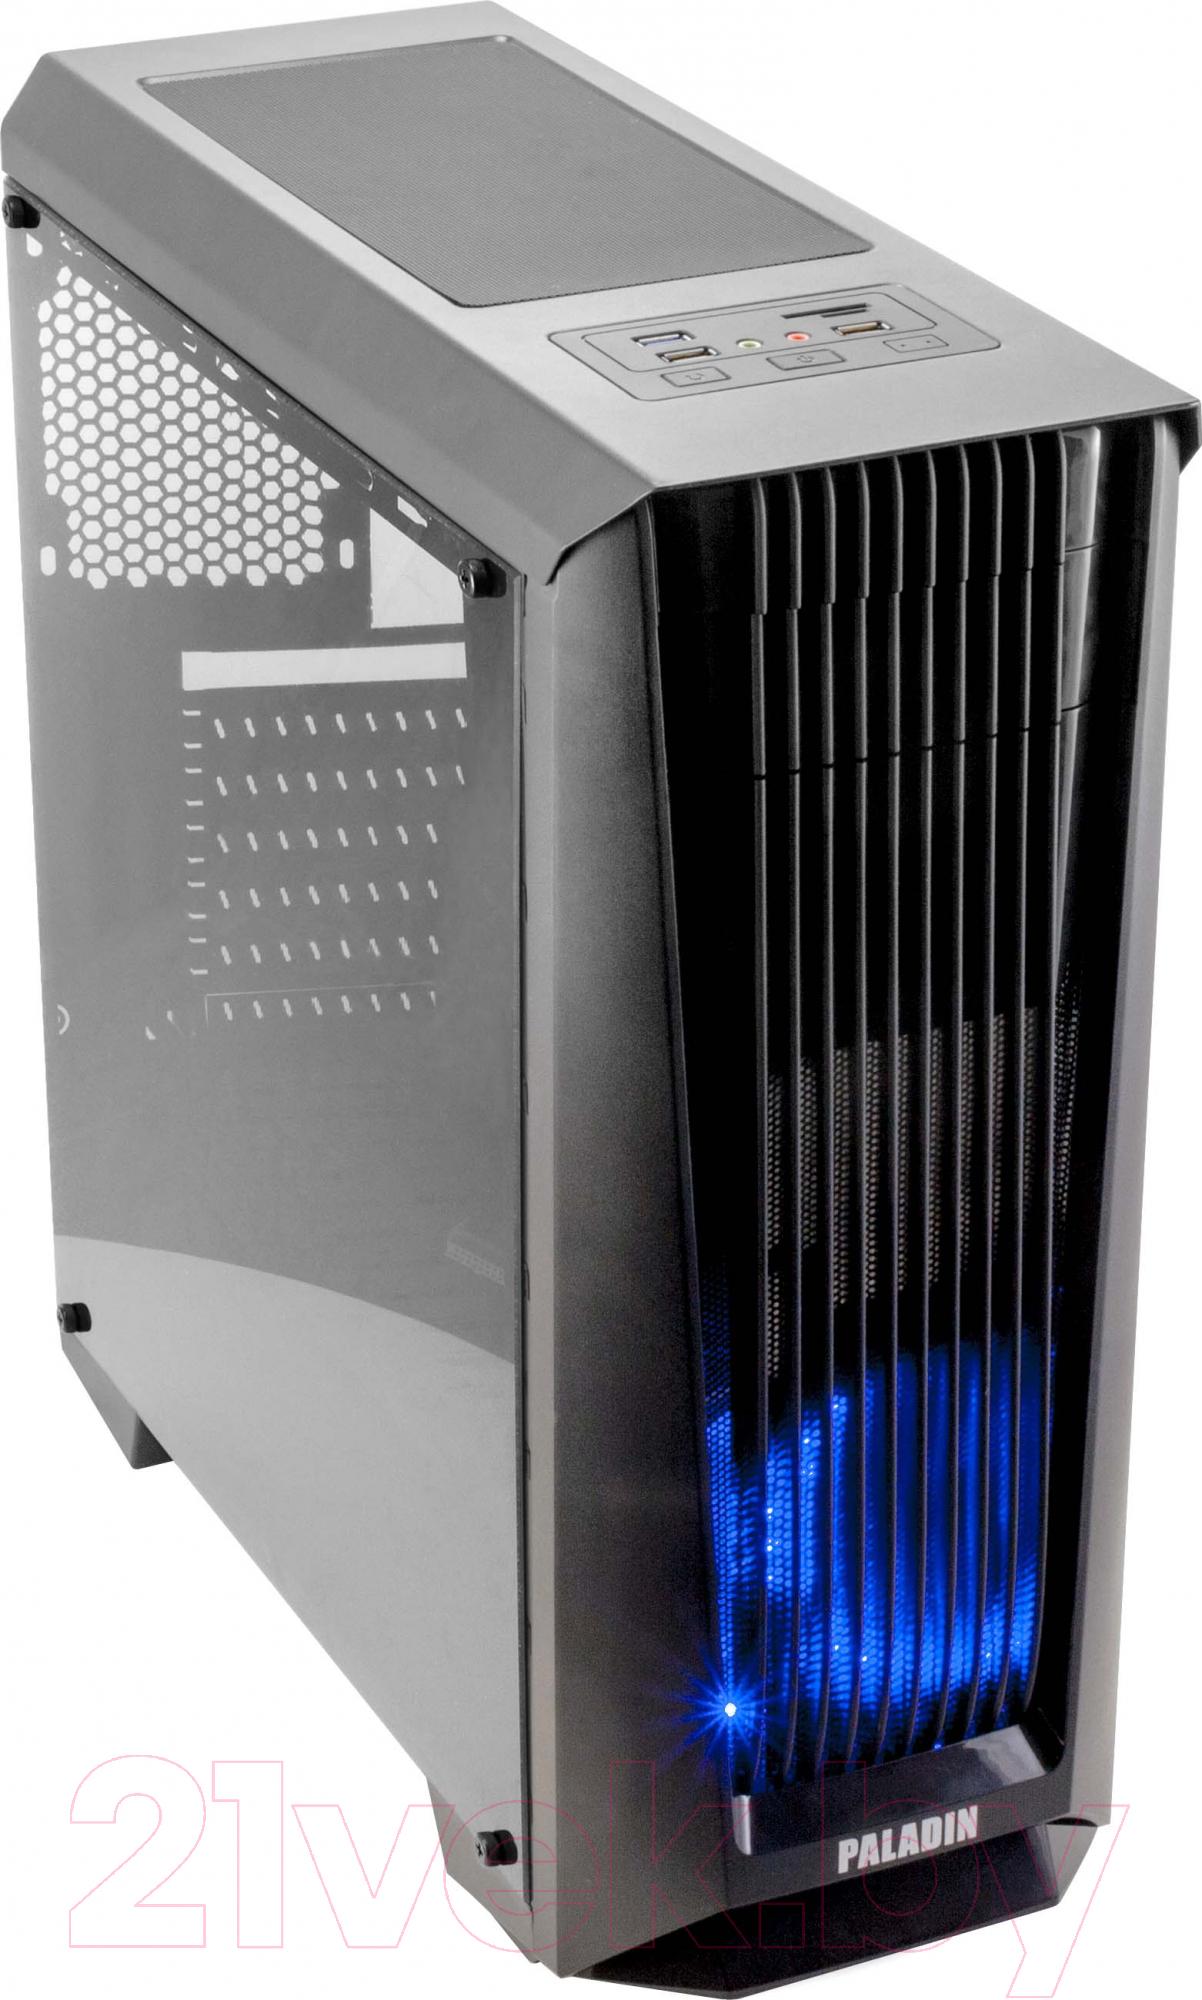 Купить Системный блок Z-Tech, I9-99K-8-120-1000-370-N-90021n, Беларусь